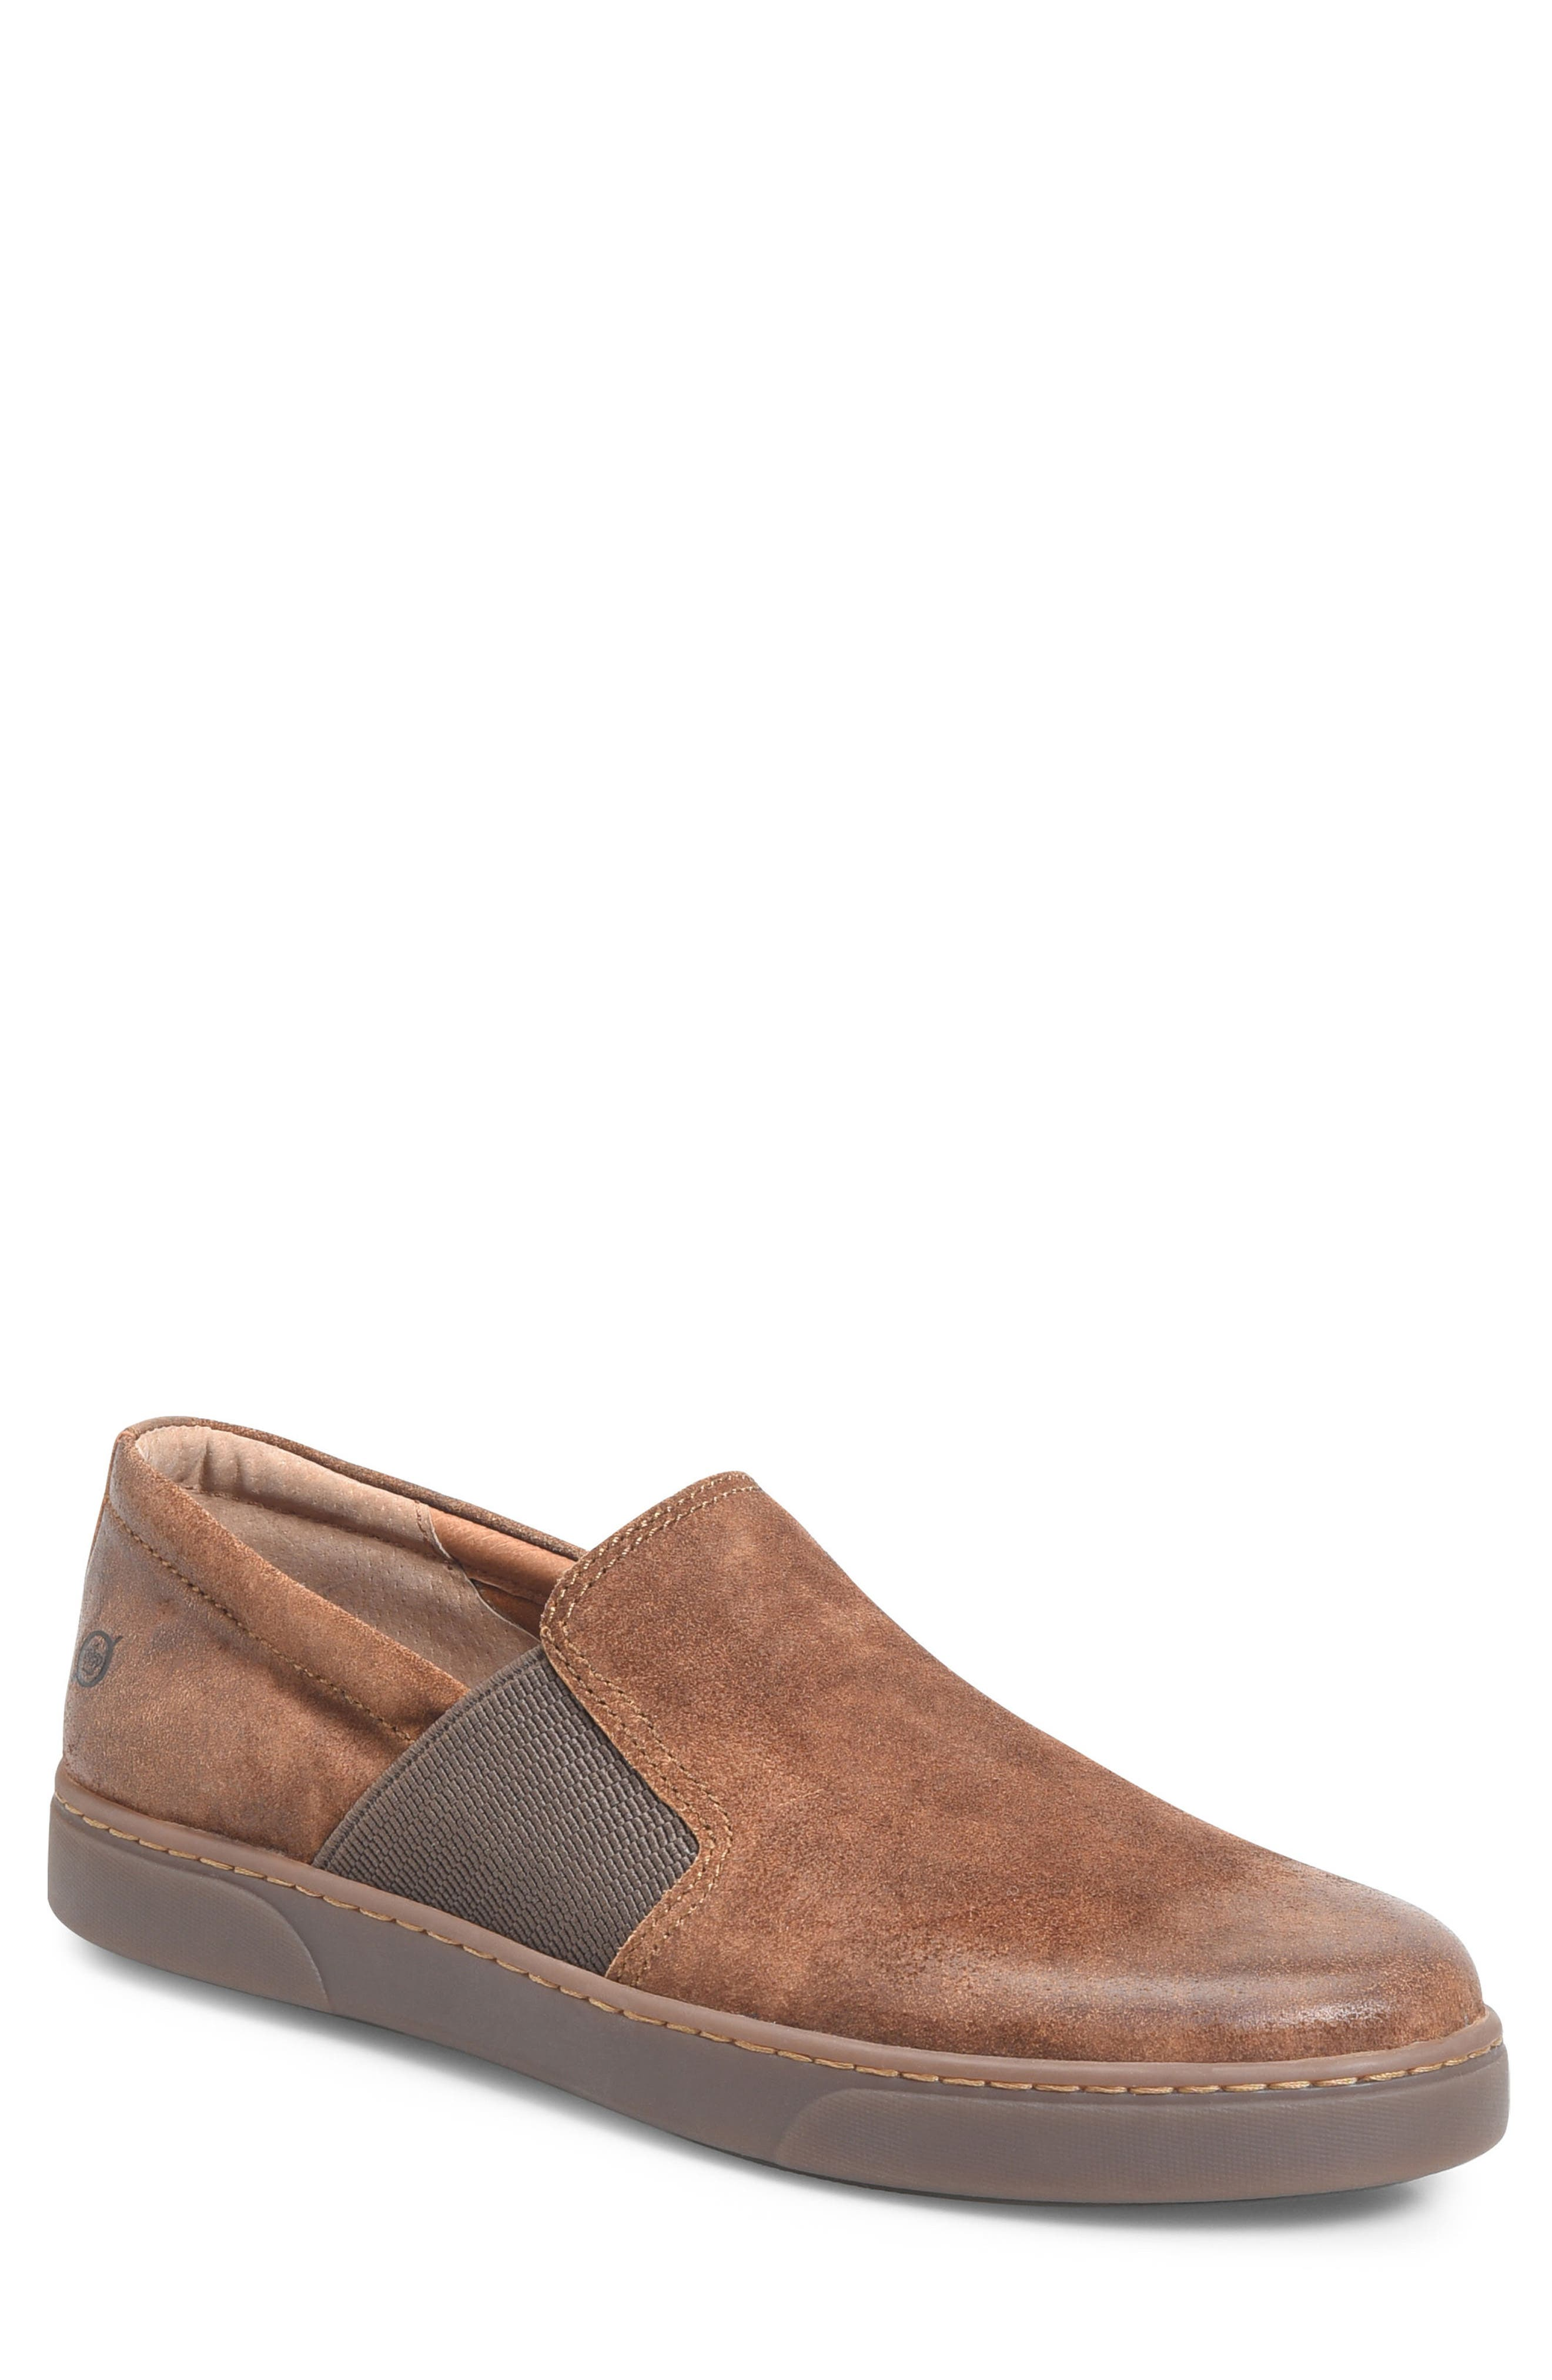 Belford Slip-On Sneaker,                         Main,                         color, 219